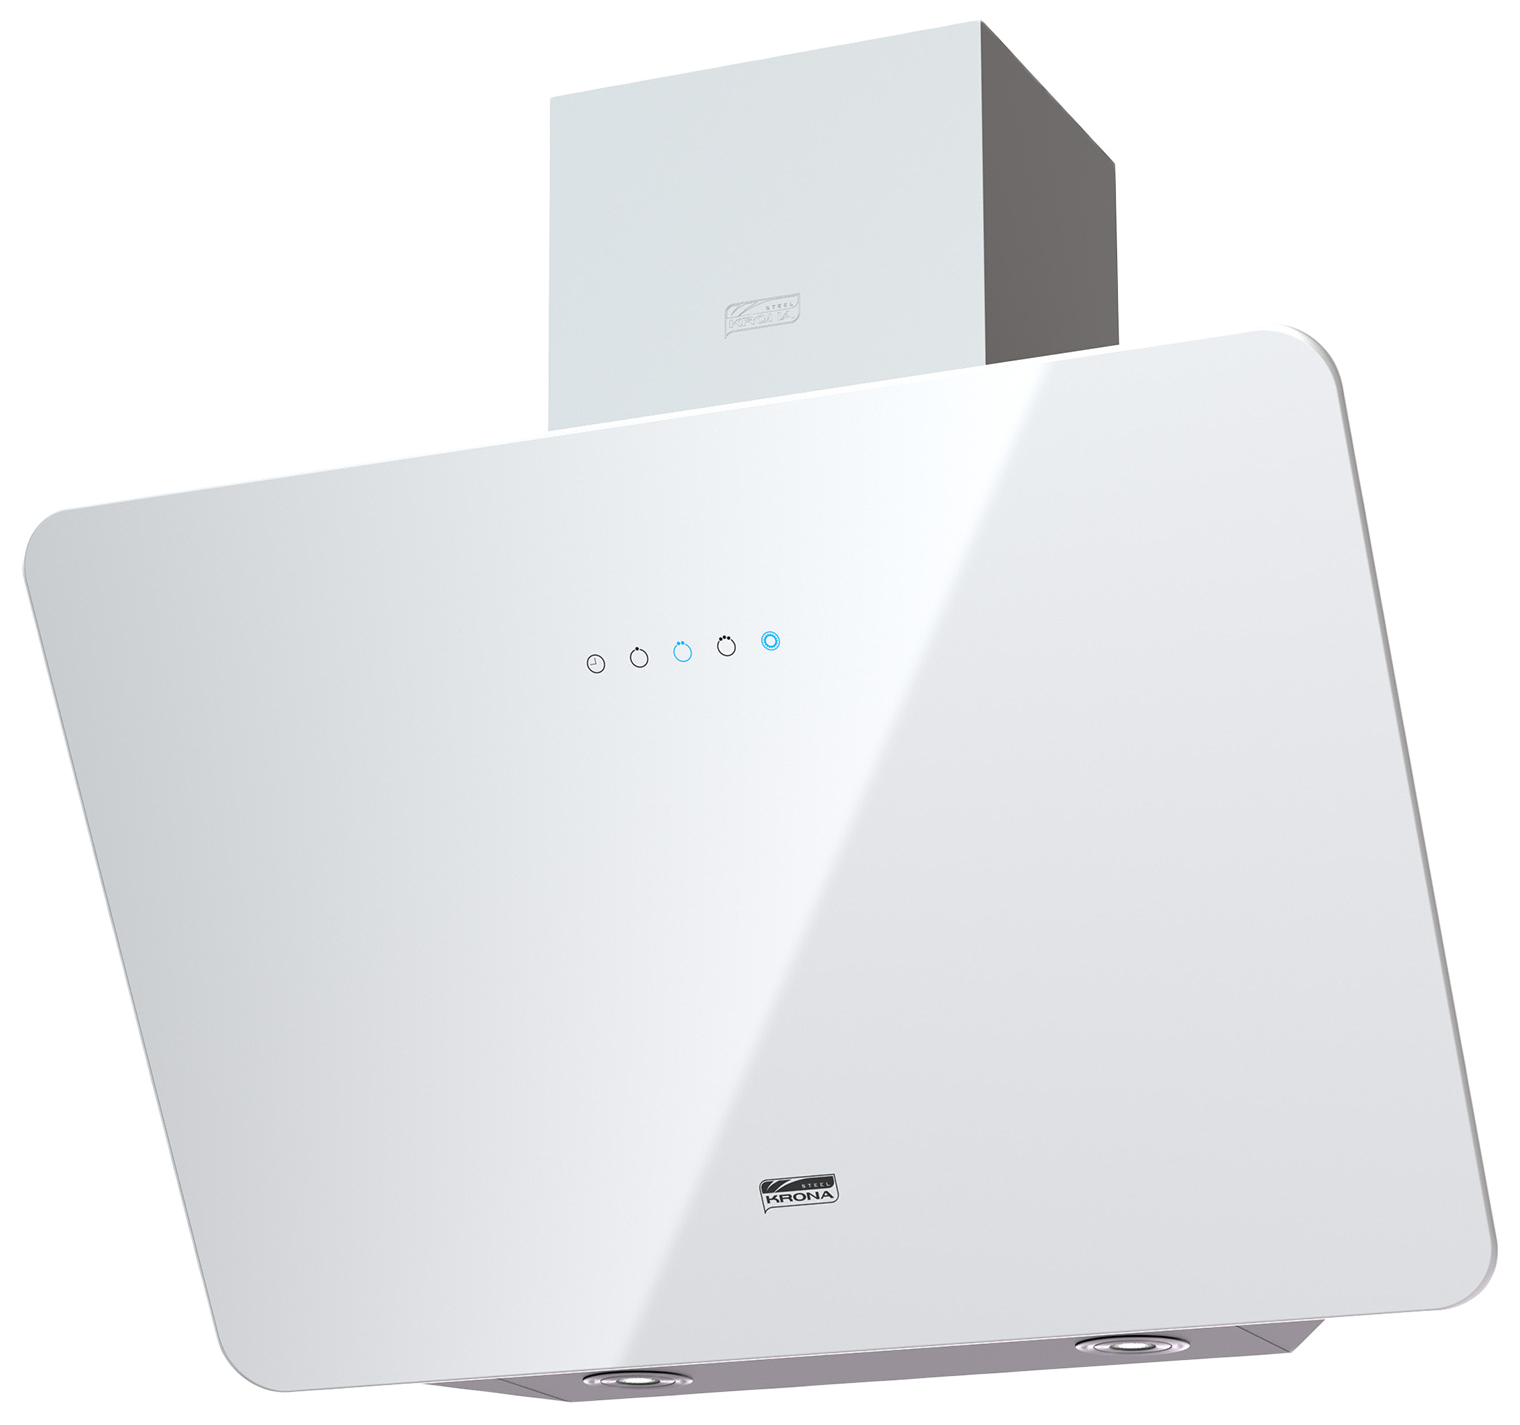 Вытяжка наклонная KRONAsteel Liora 600 S White фото